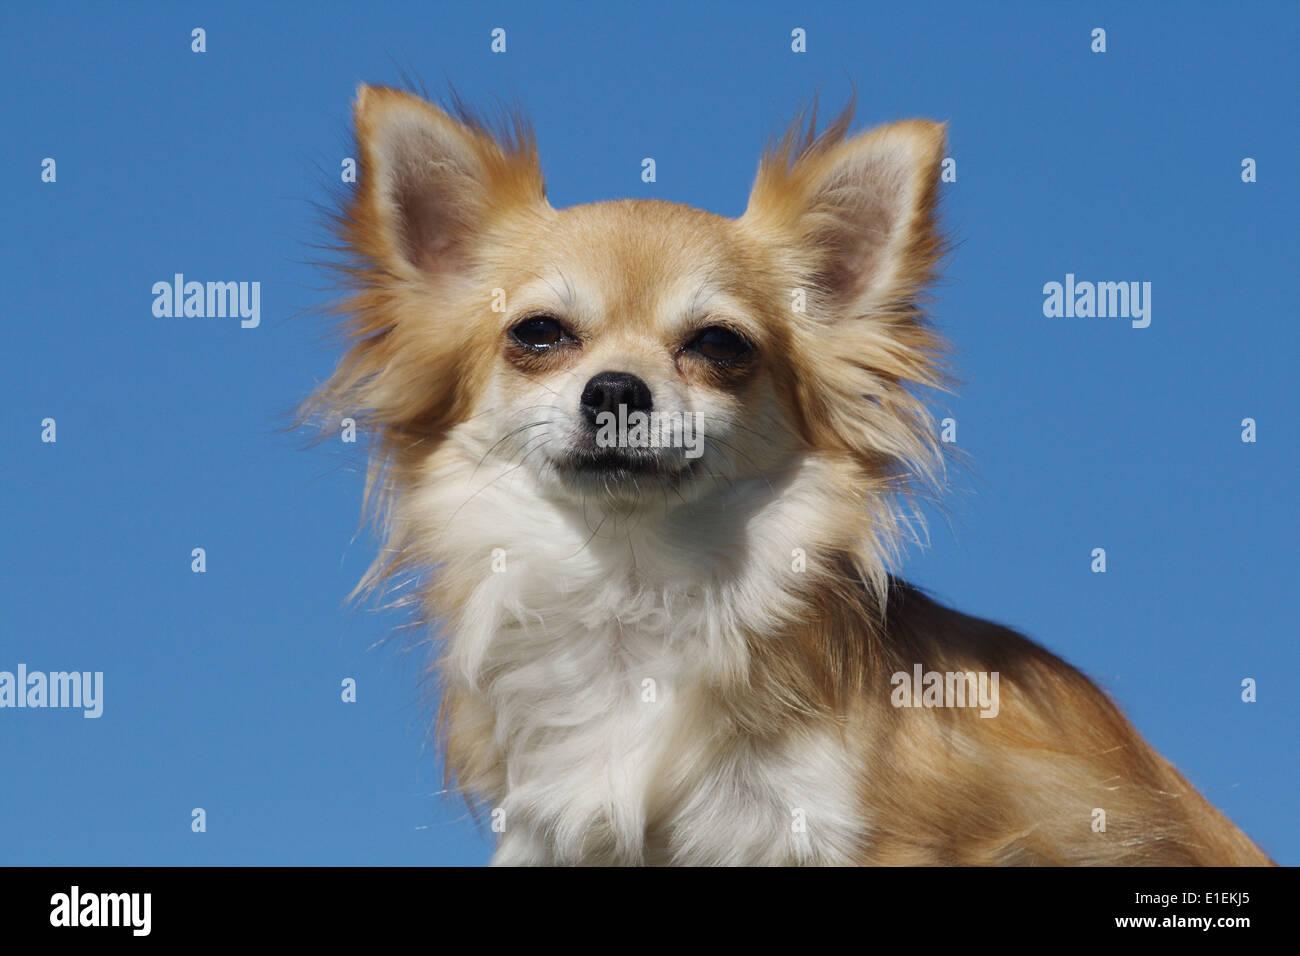 Chihuahua Langhaar Portrait am blauen Himmel - Stock Image